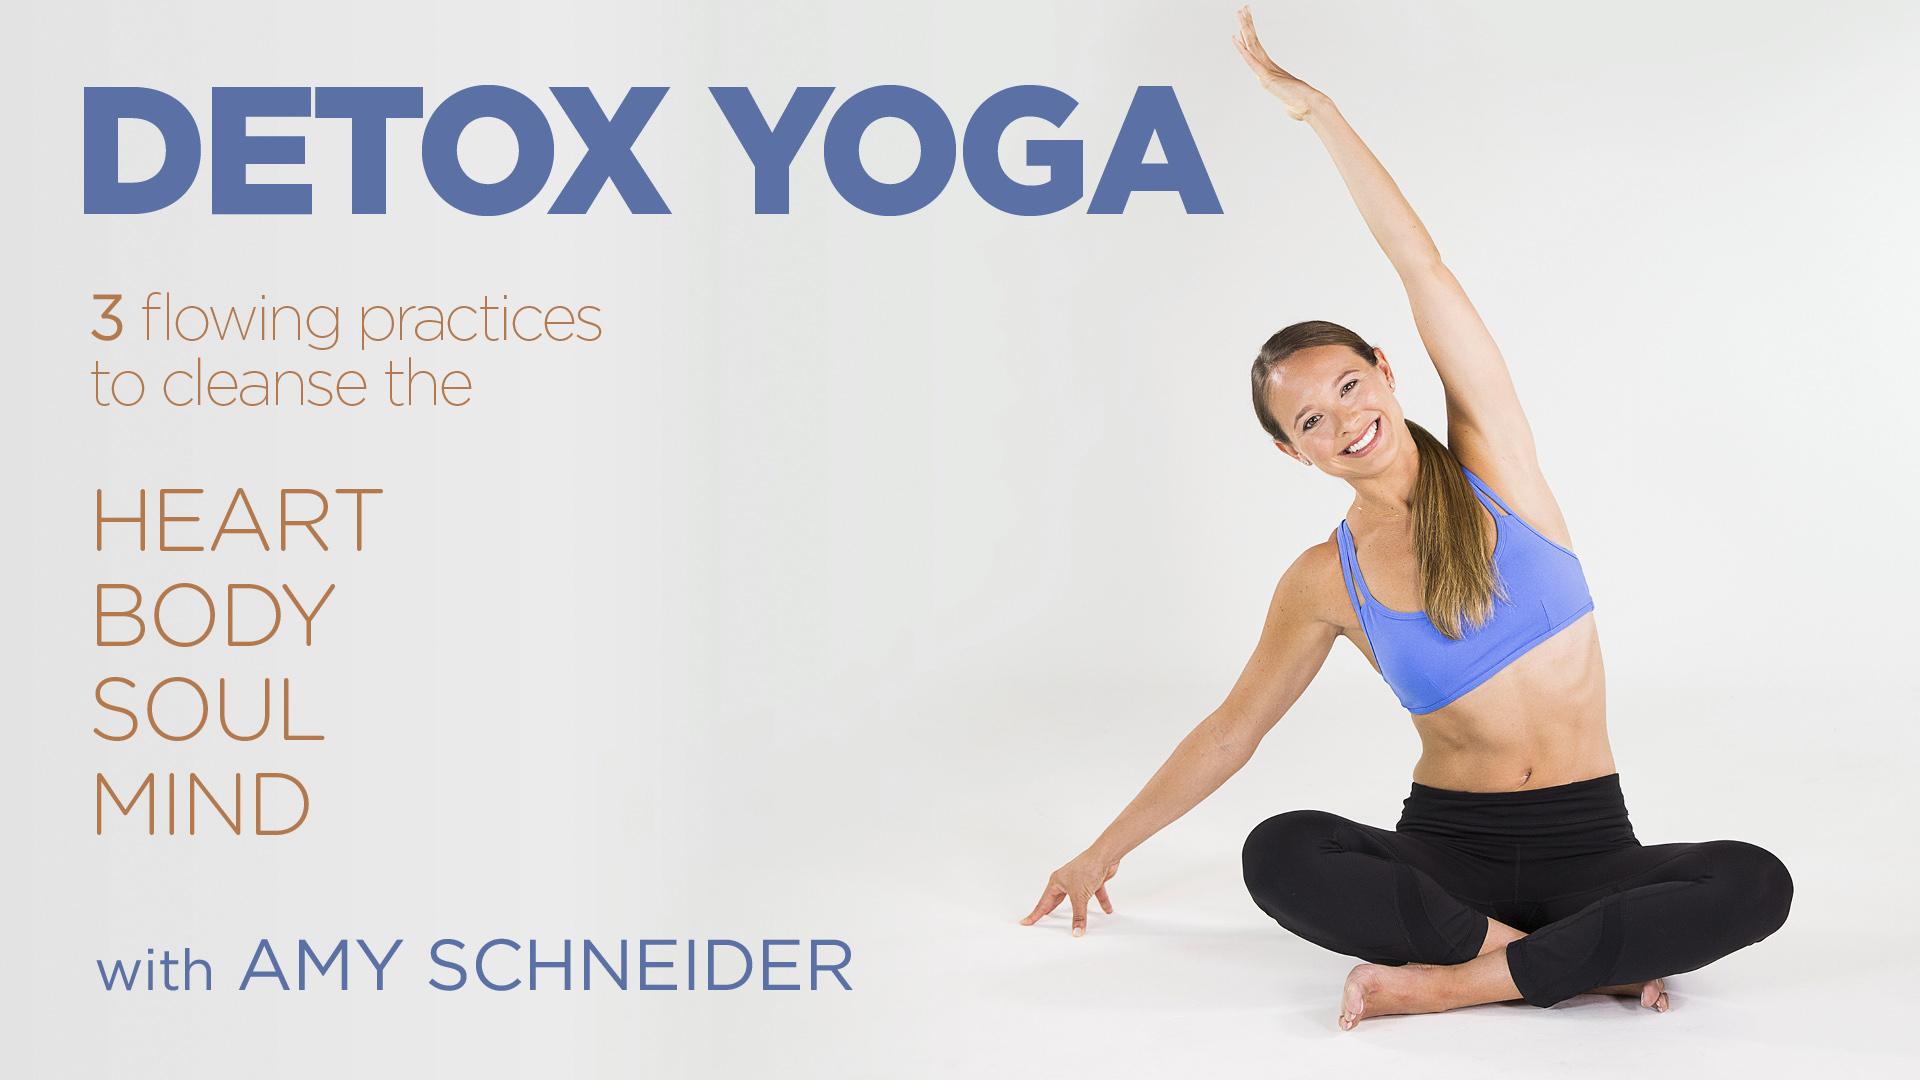 Detox Yoga Flow with Amy Schneider